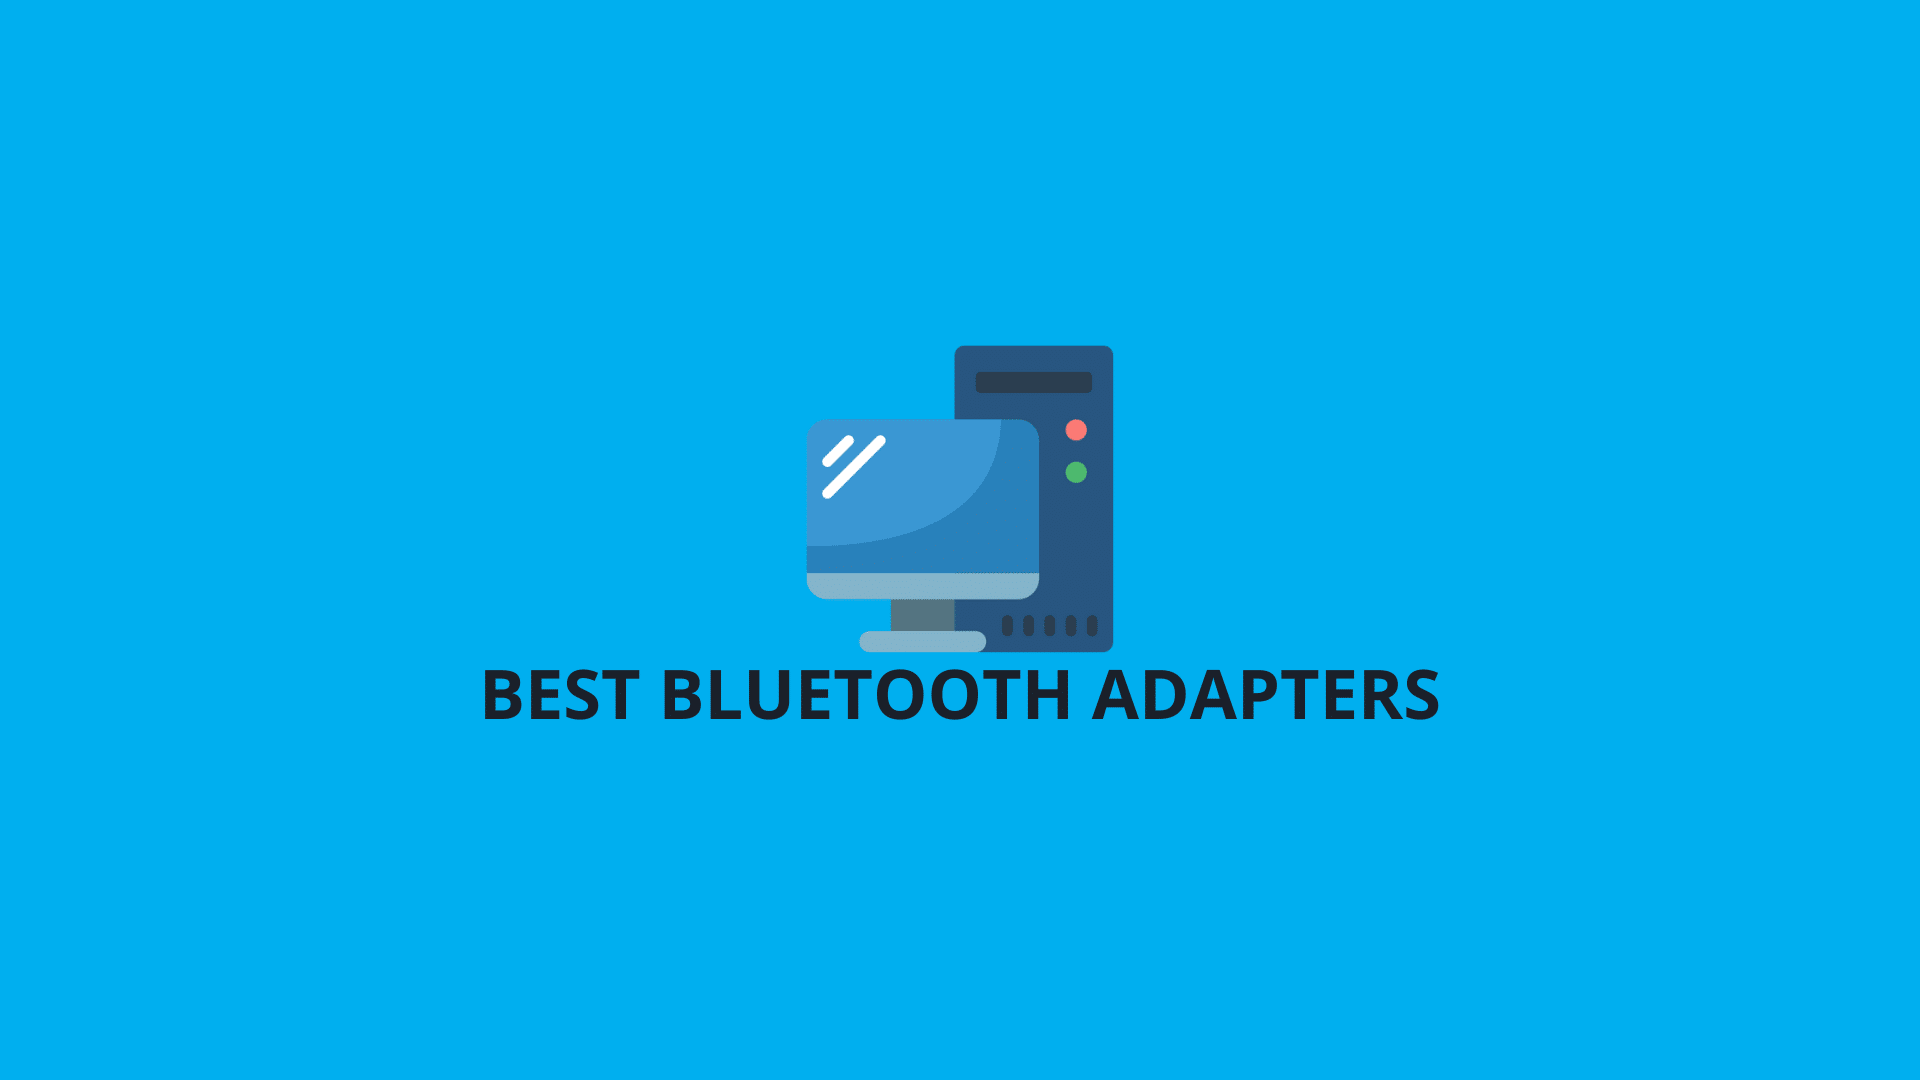 Best Bluetooth Adapters